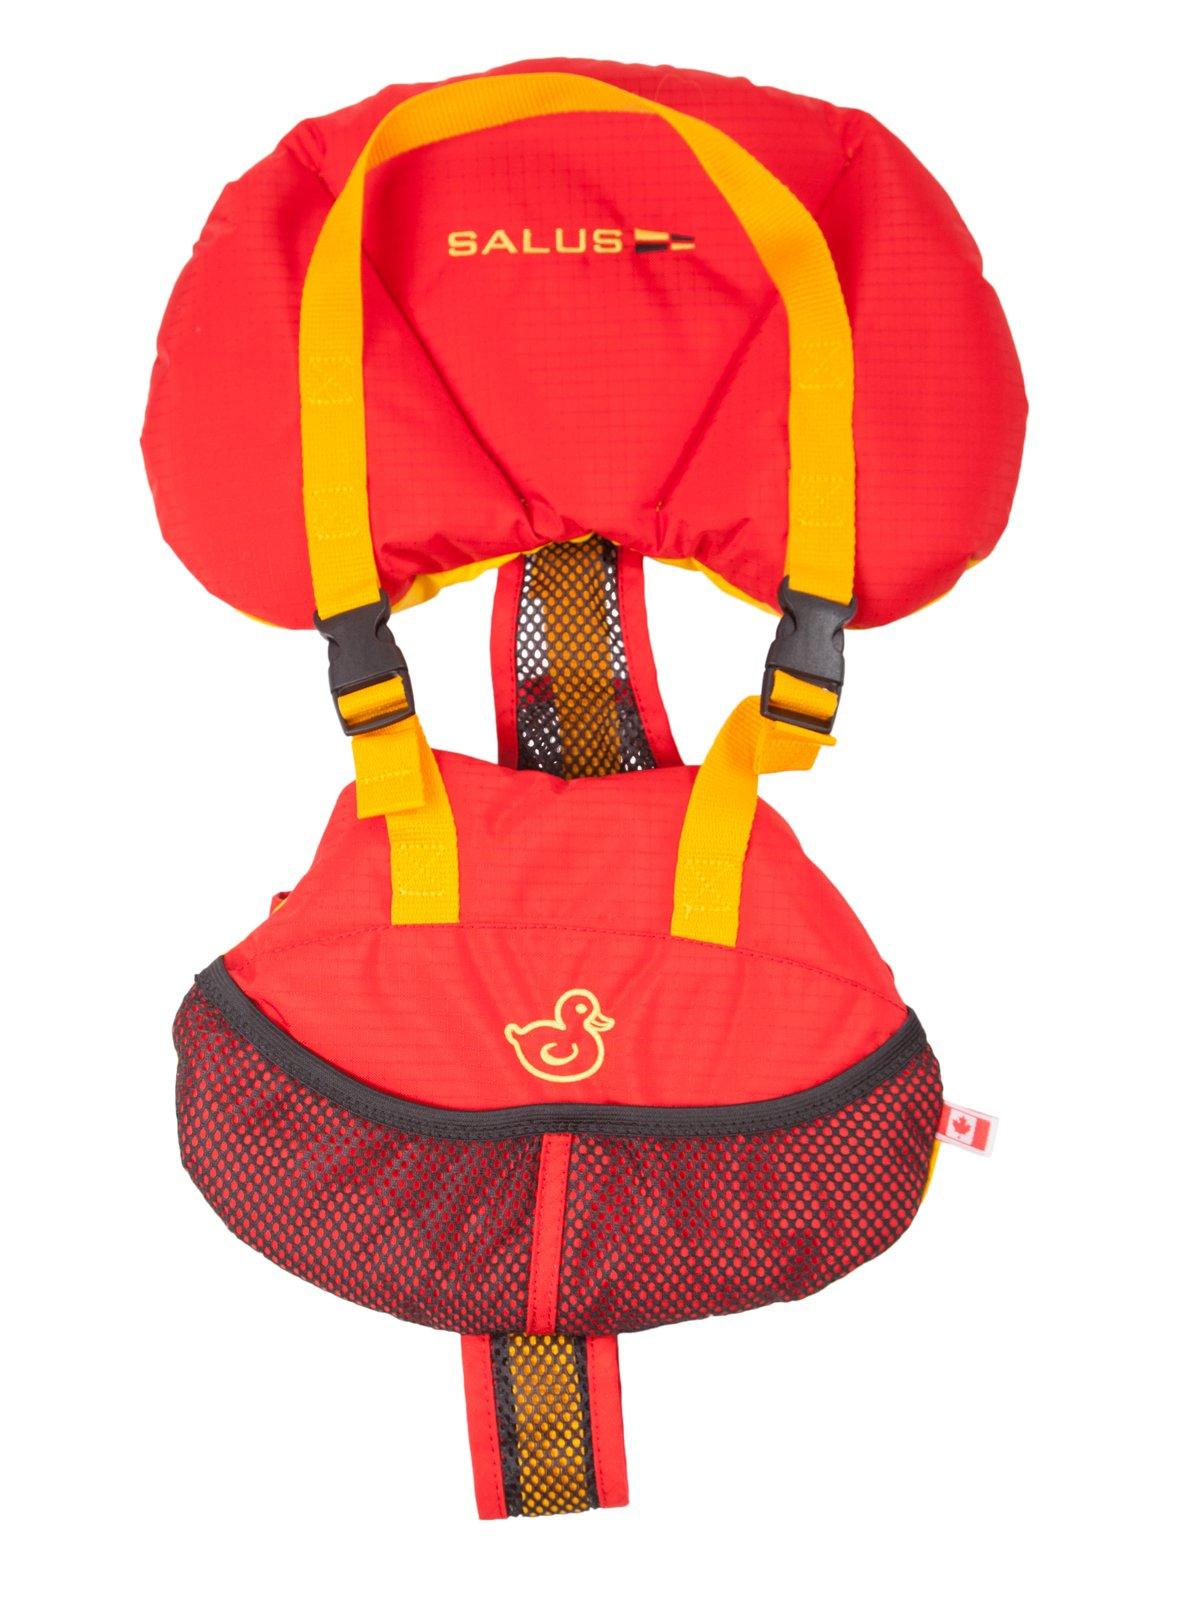 Salus Bijoux Baby Vest - Red by Salus (Image #1)